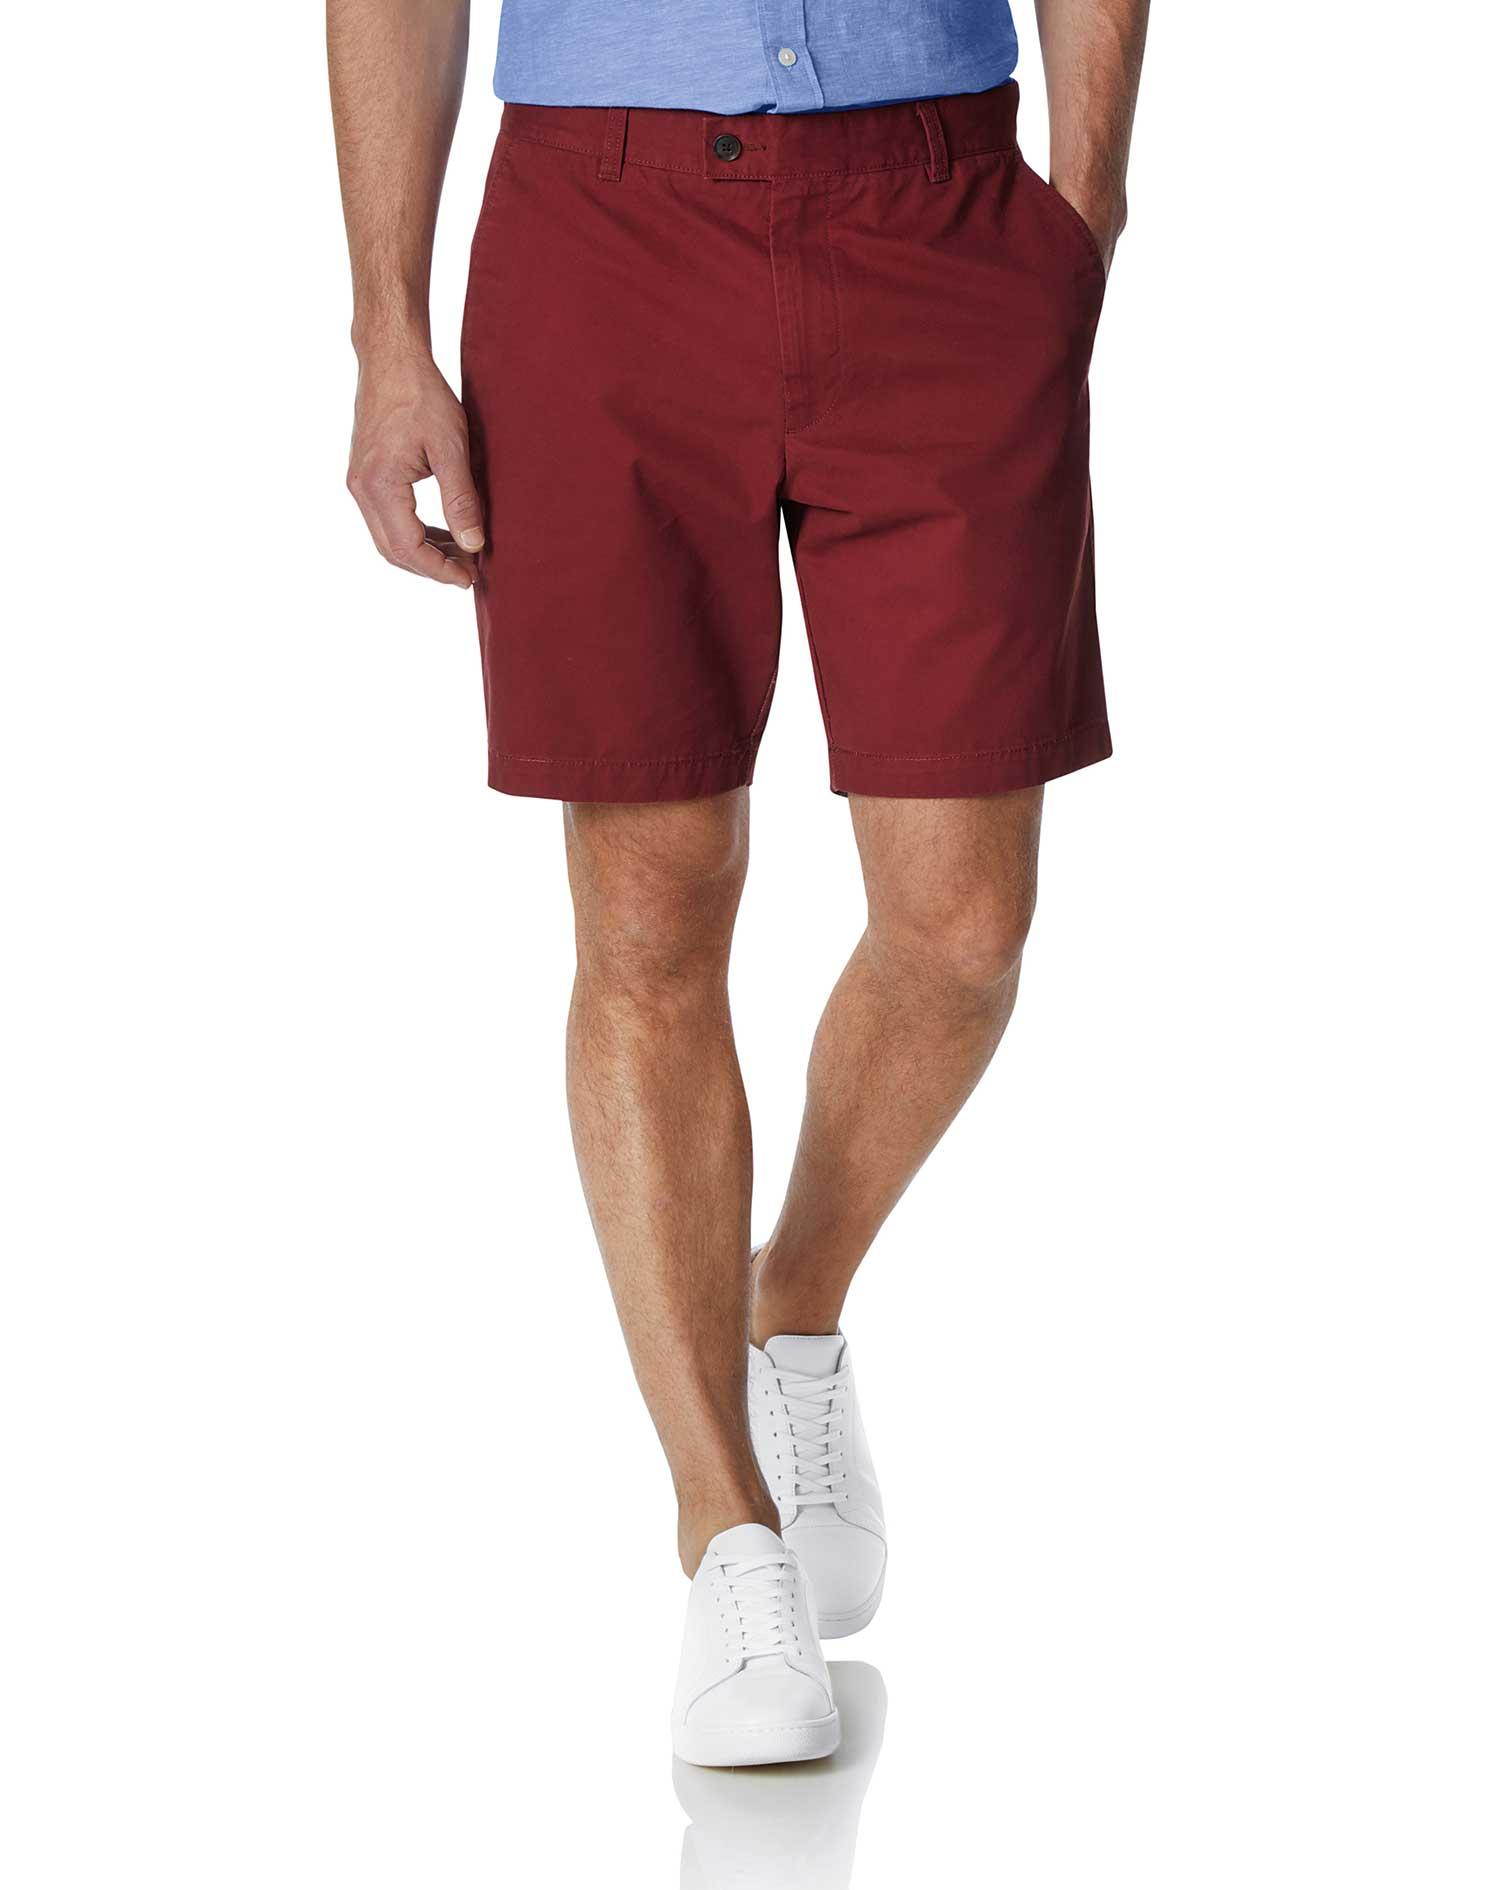 Dark Red Chino Cotton Shorts Size 38 by Charles Tyrwhitt